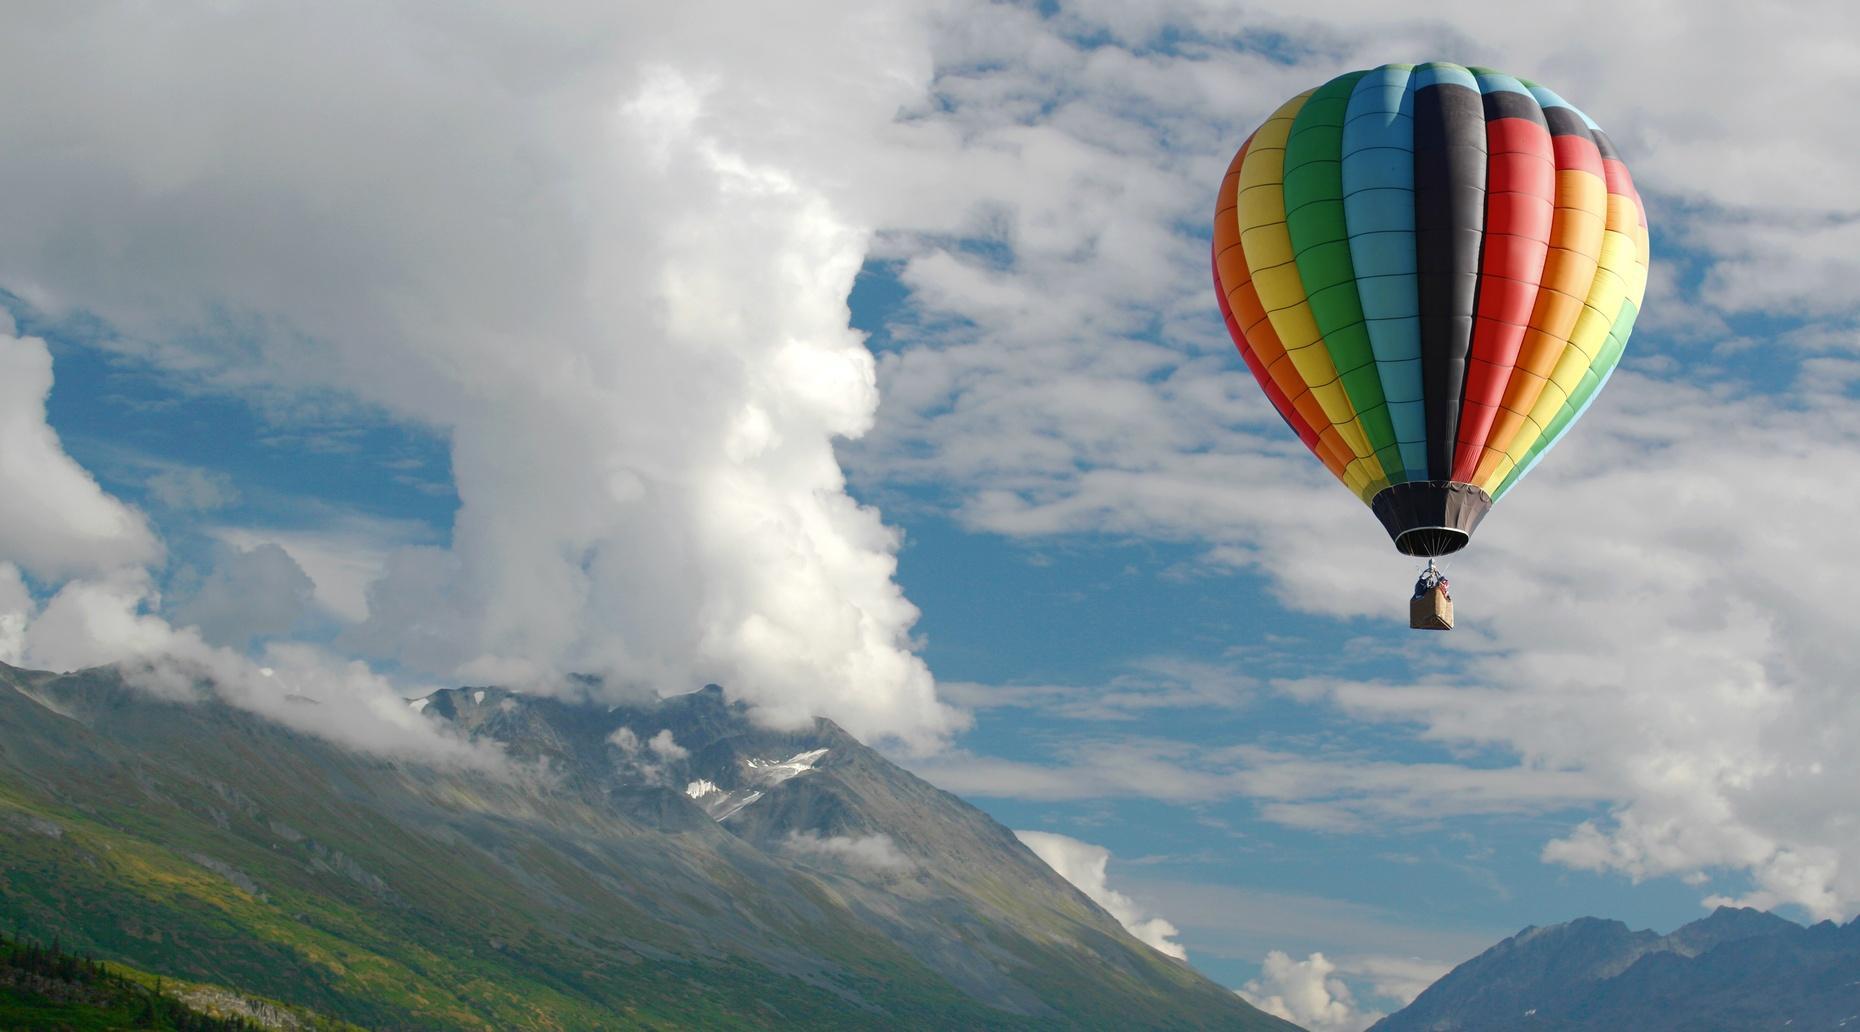 Anniversary Hot Air Balloon Flight Over Teotihuacán